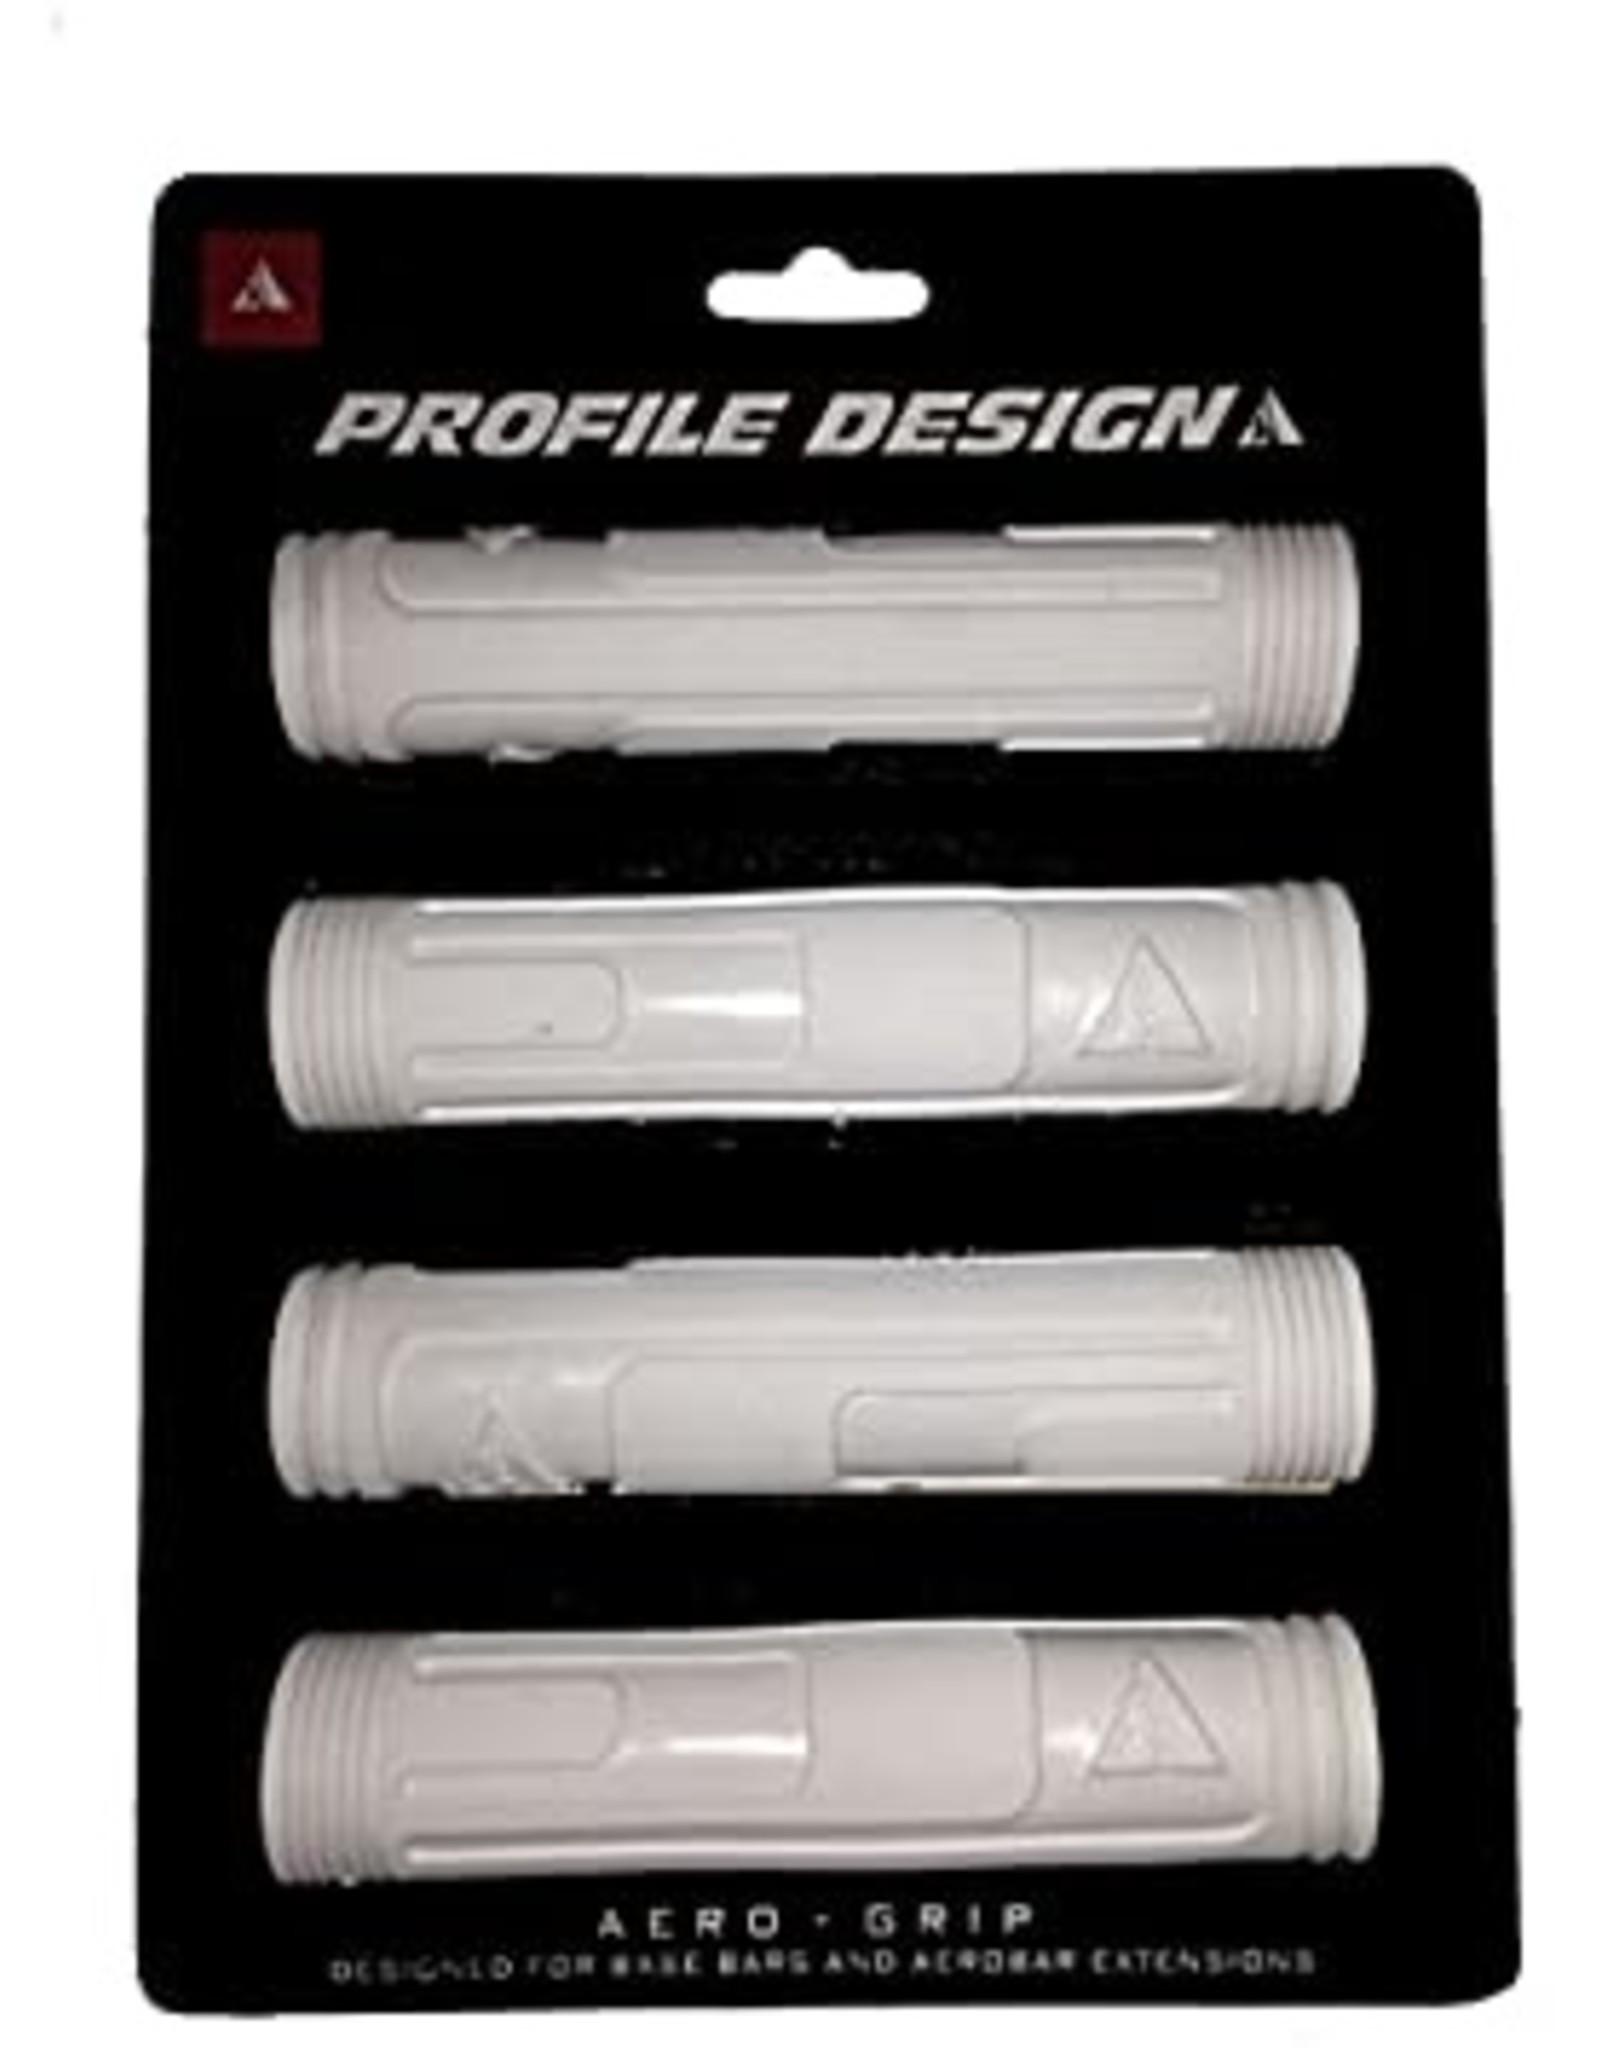 Profile Design Grip Profile Aerogrip Black/Clear